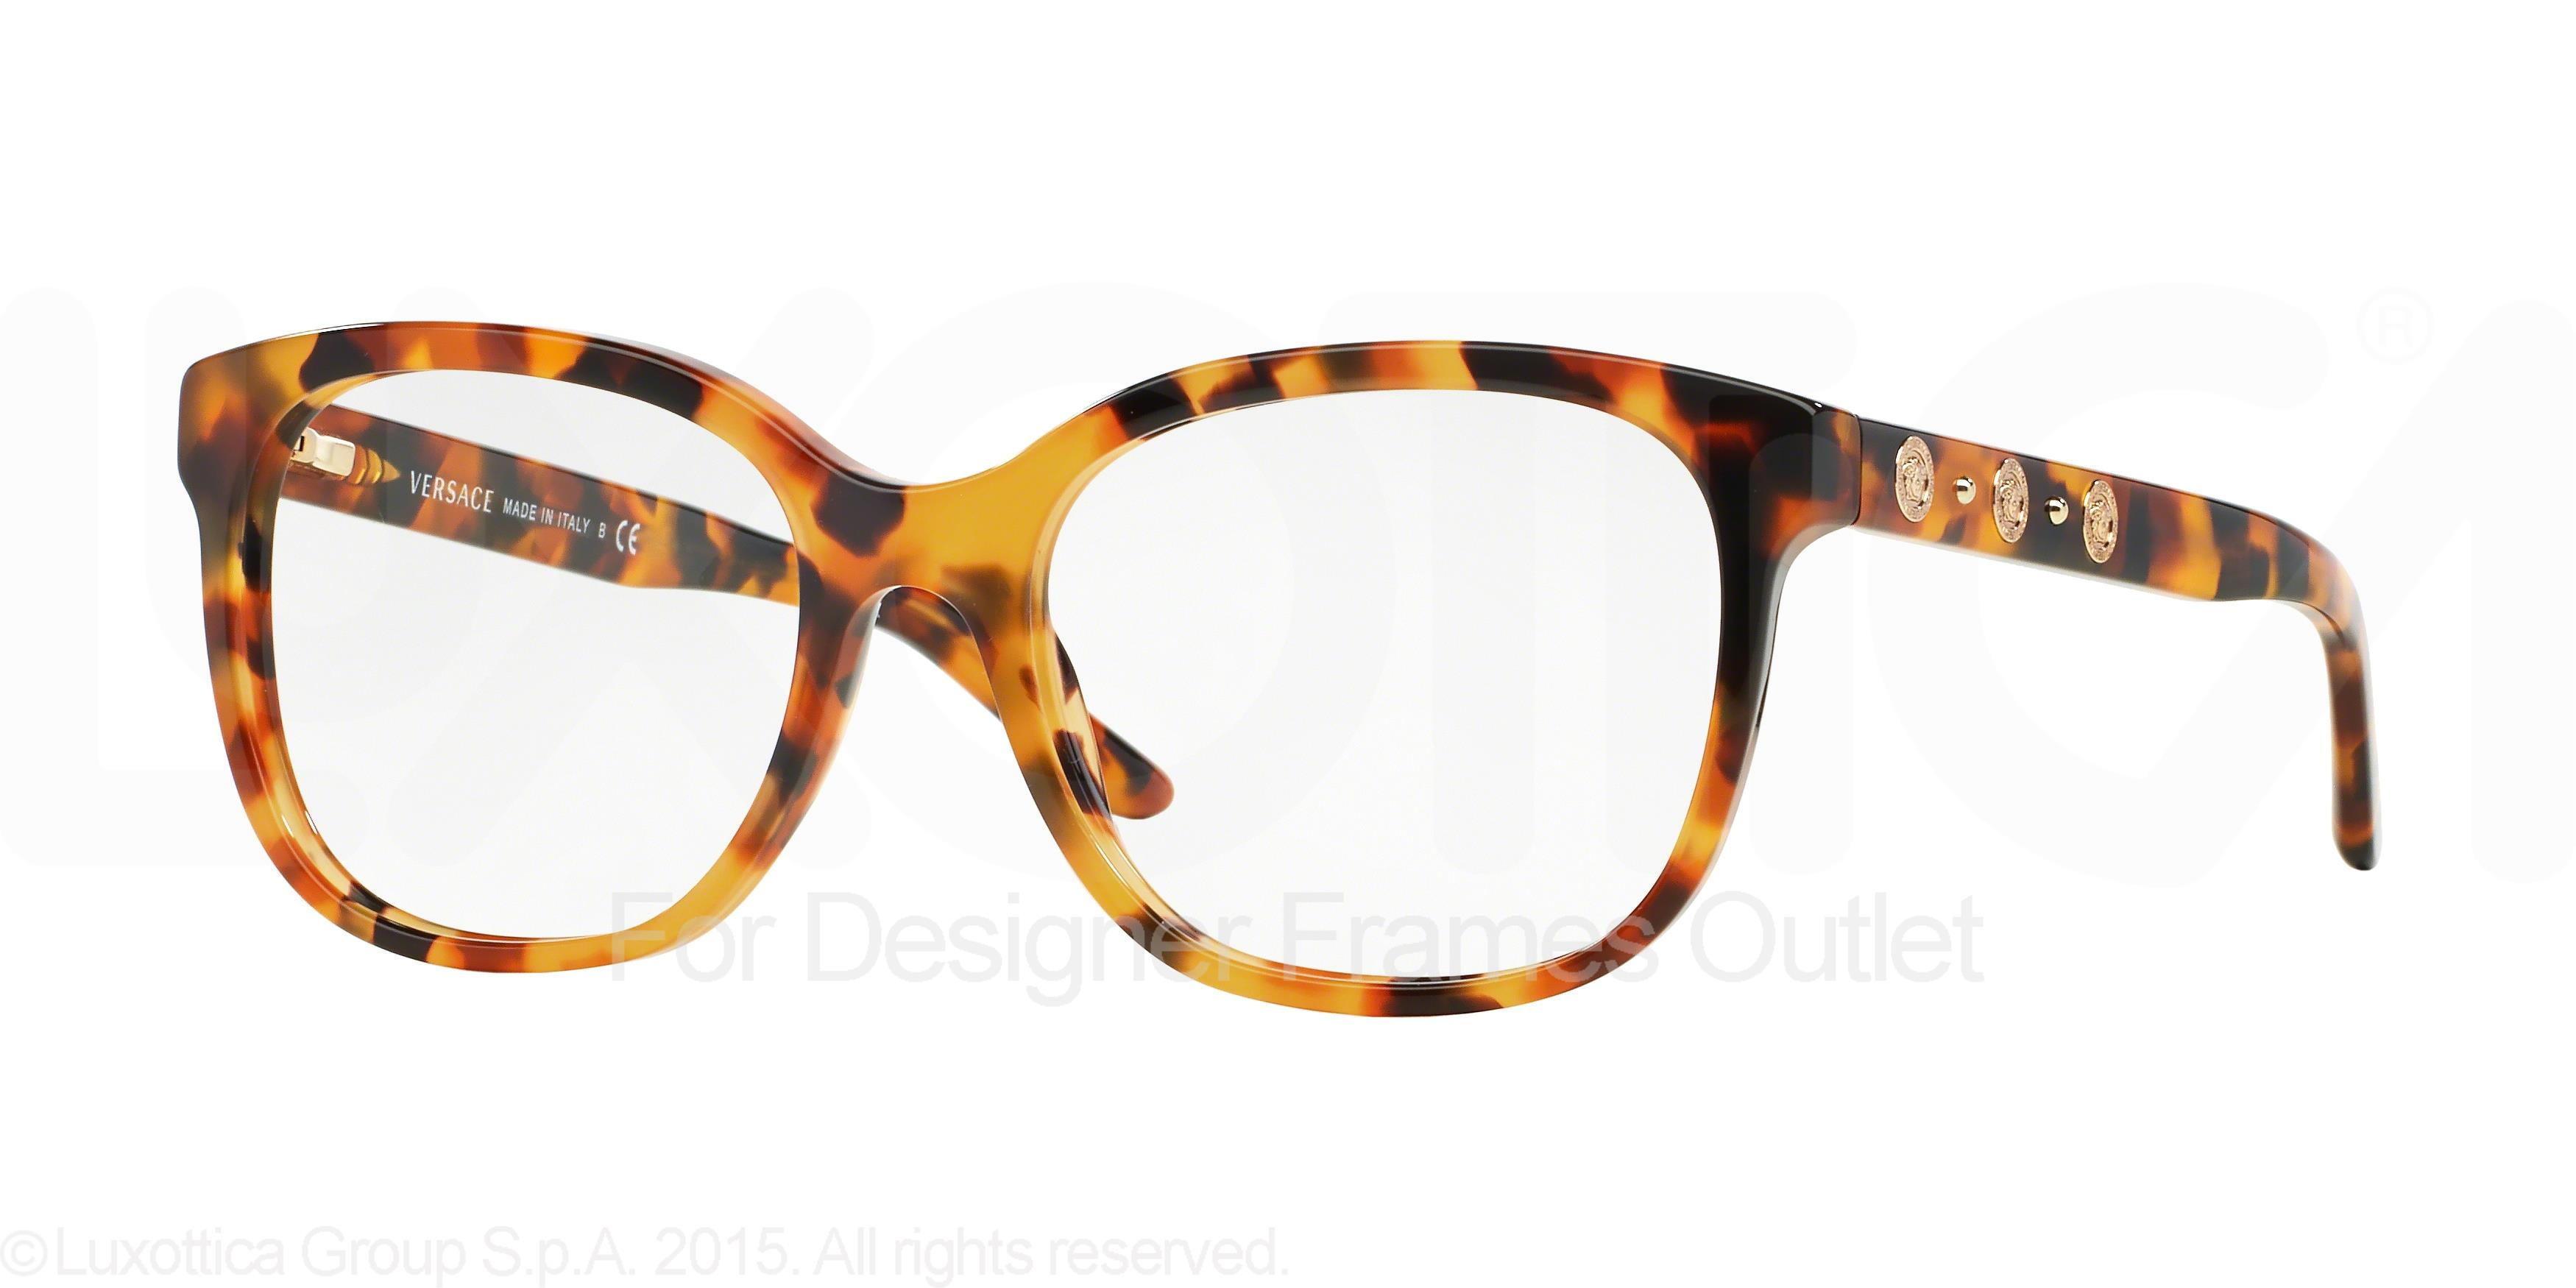 81702bac333e Designer Eyeglass Warehouse